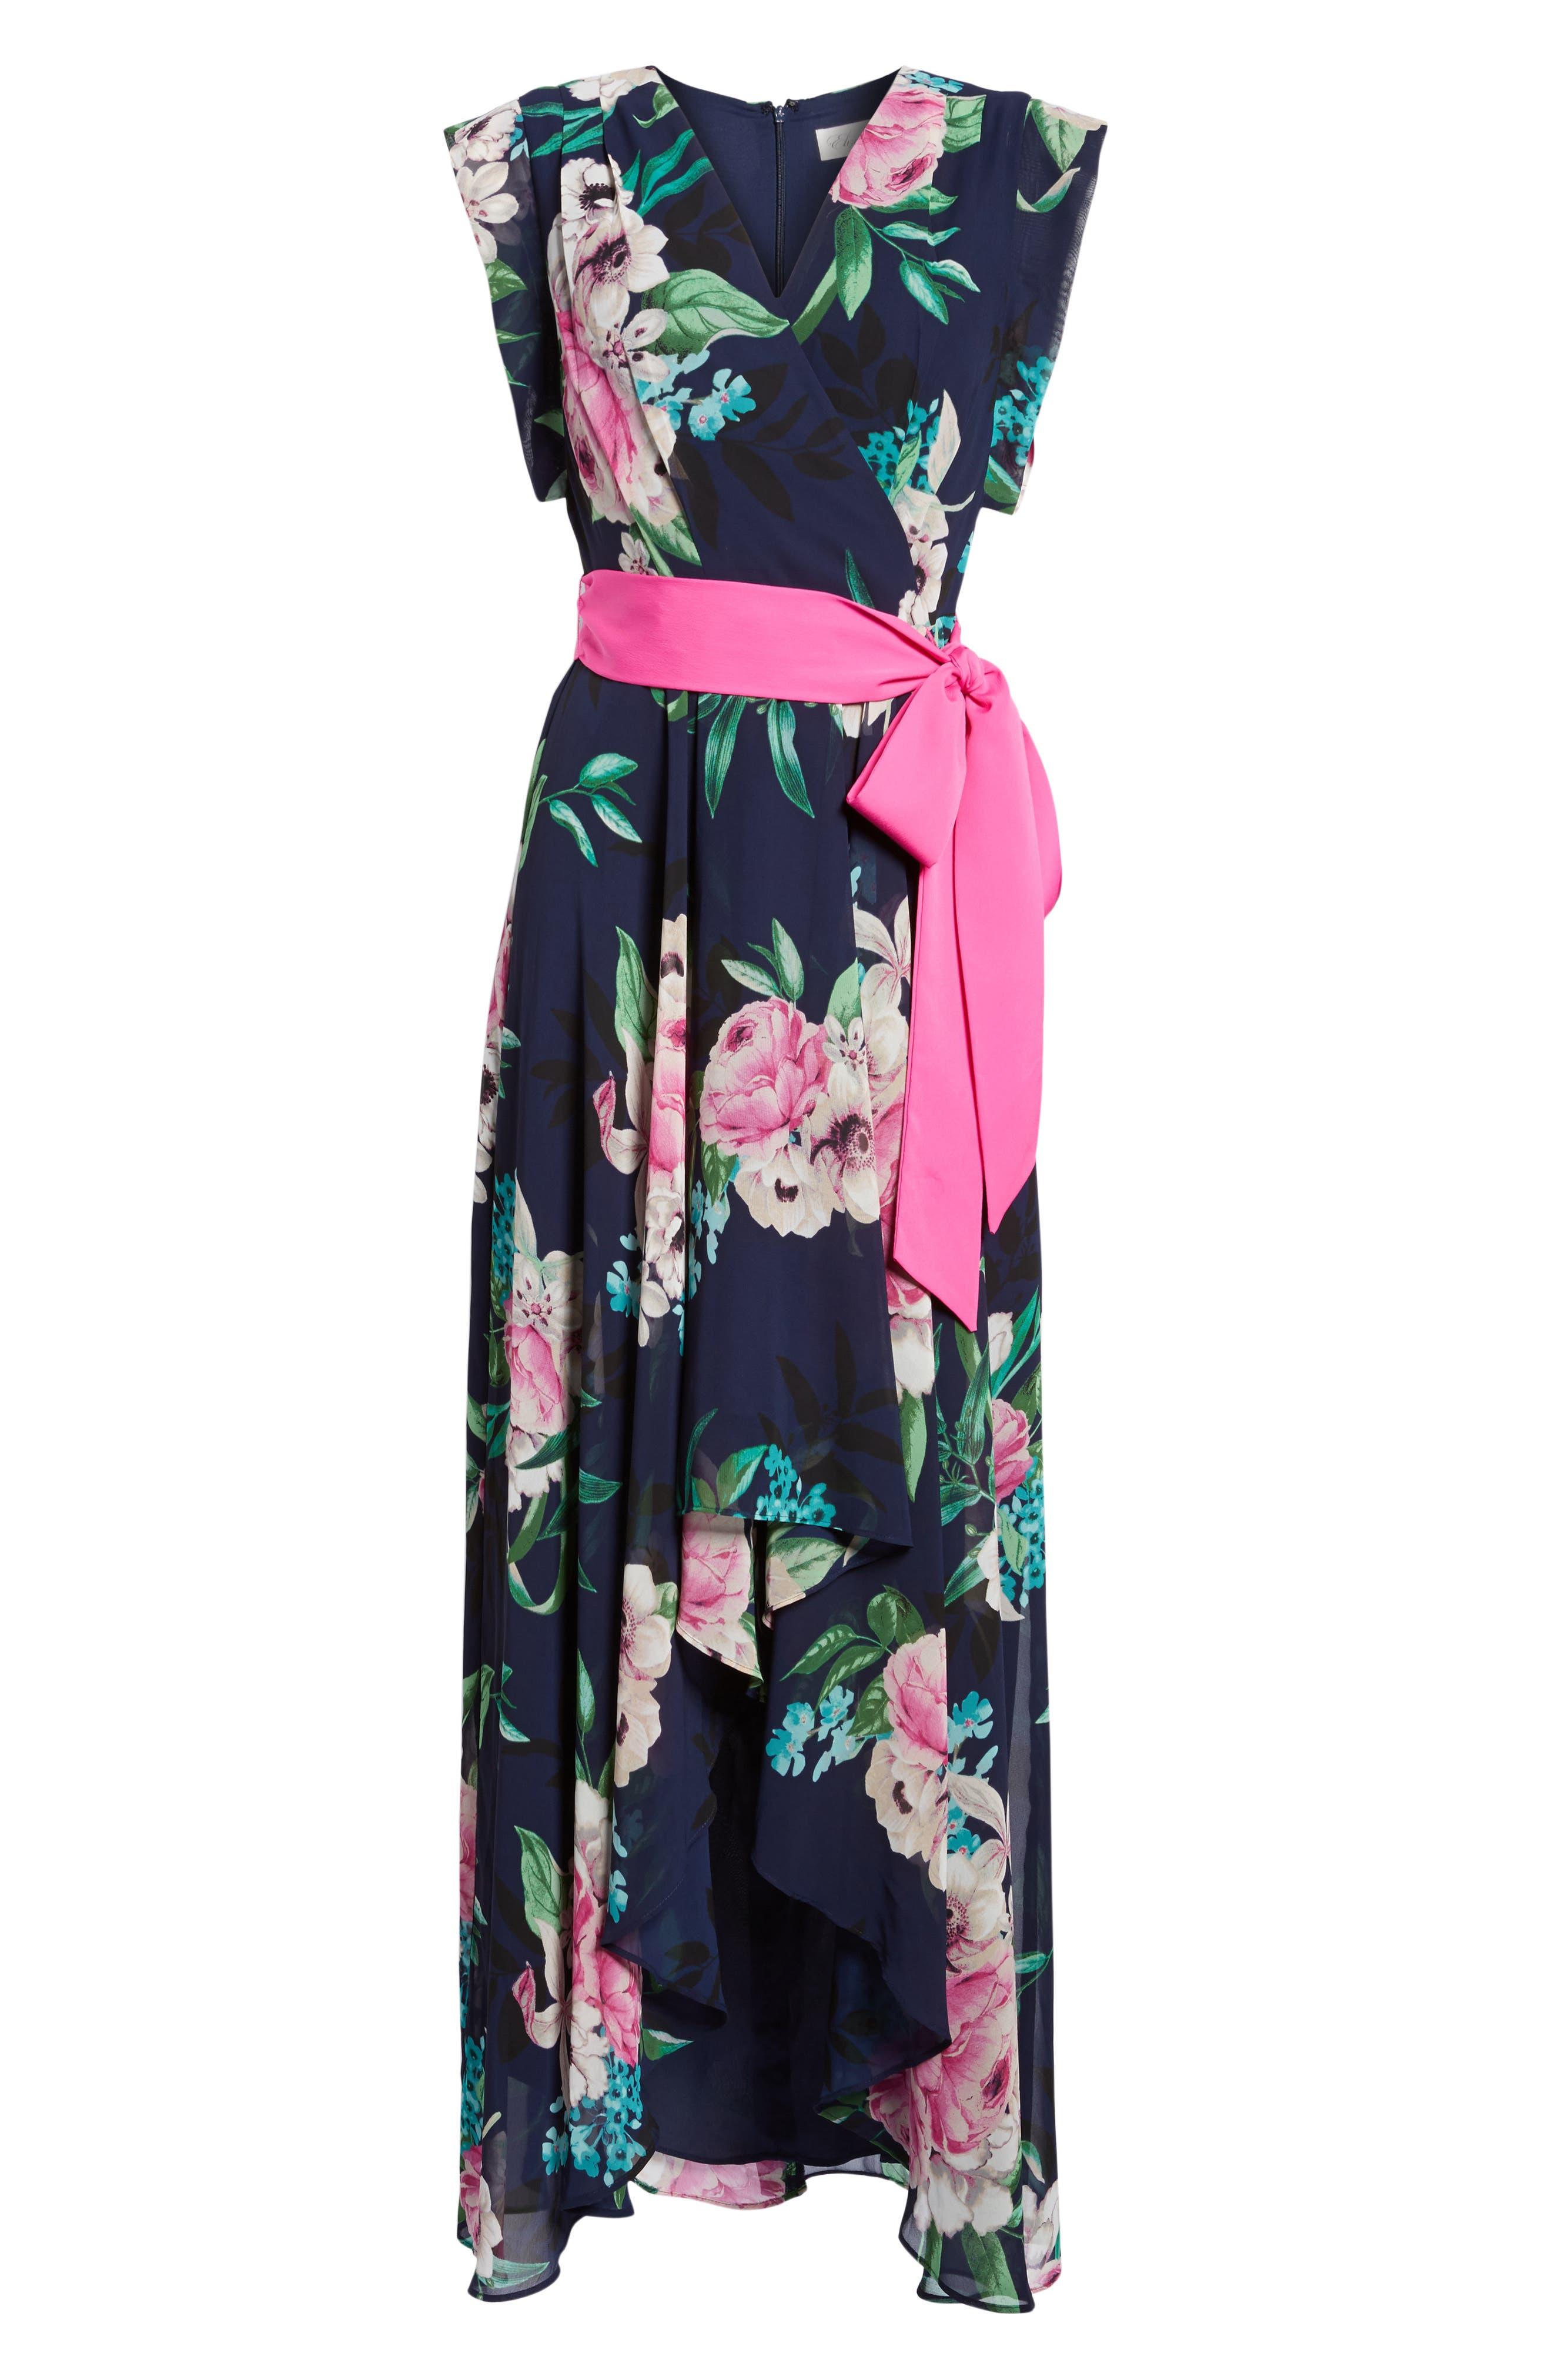 ELIZA J Floral Print Chiffon High/Low Dress, Main, color, 470